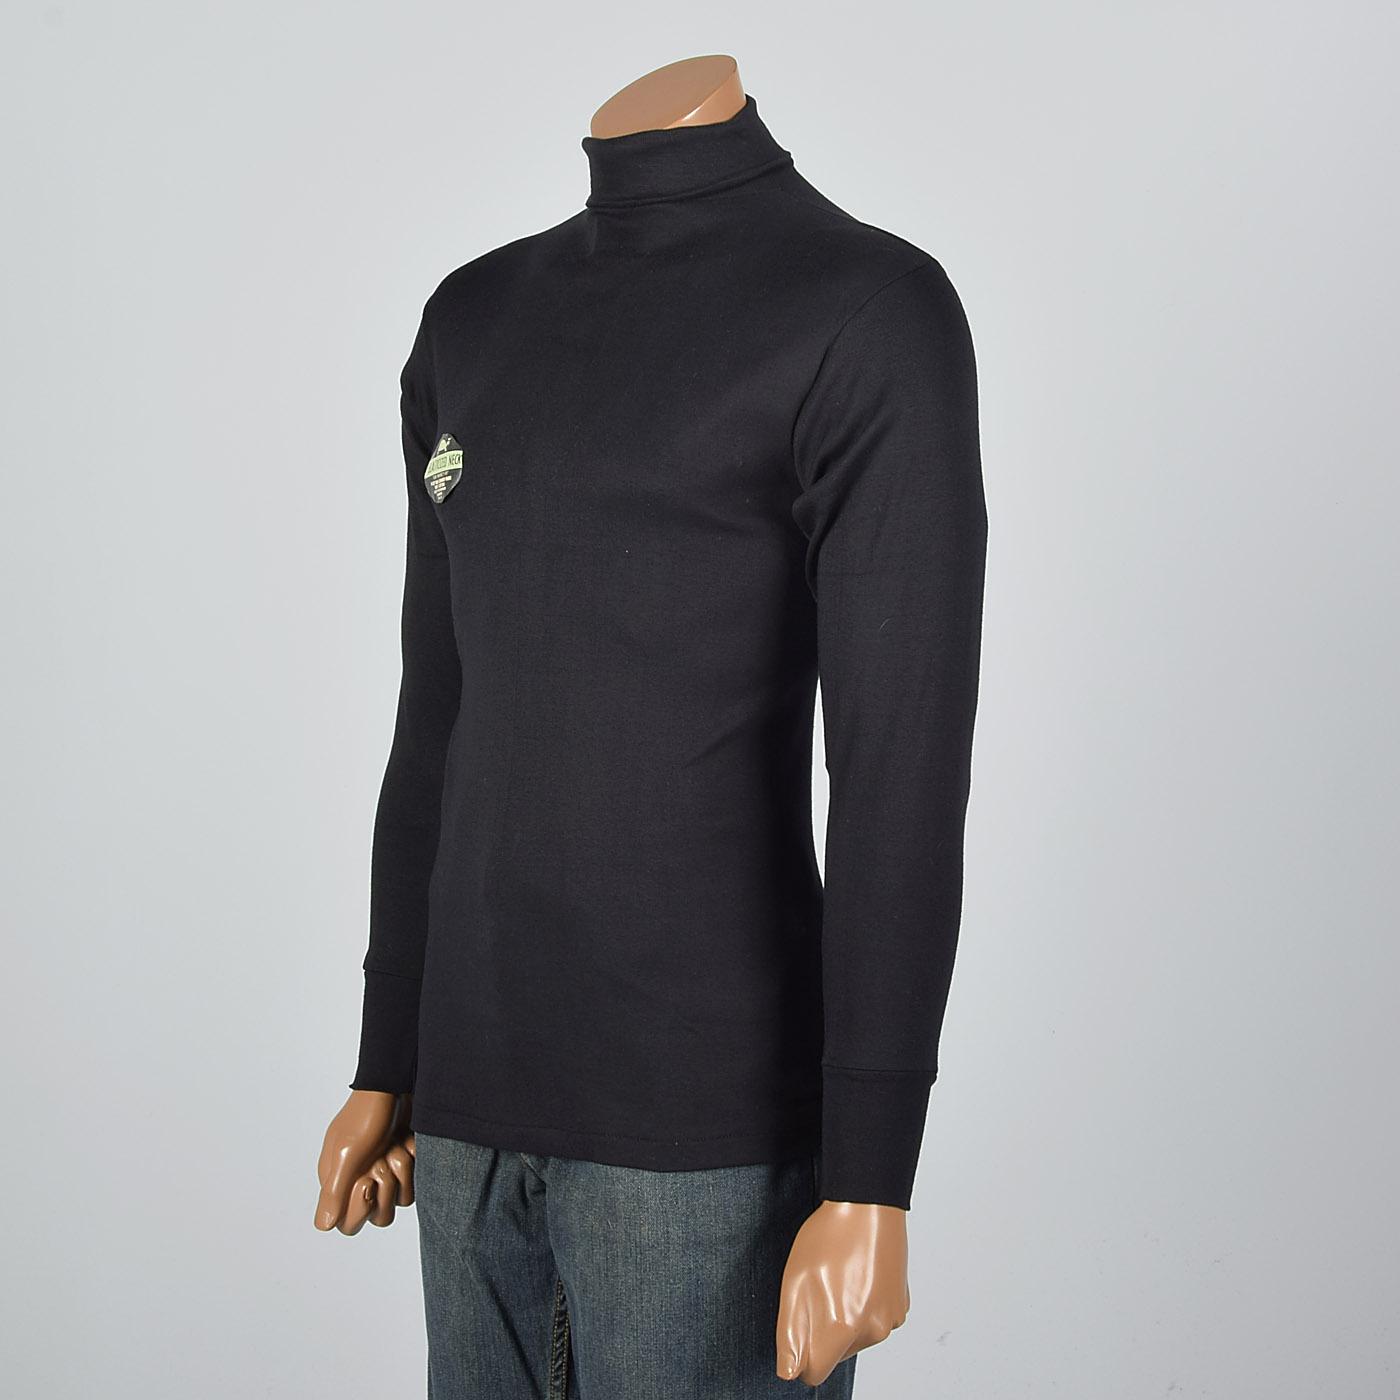 Nos Vtg 1960s Mens Tight Black Loopwheel Turtleneck Long Sleeve